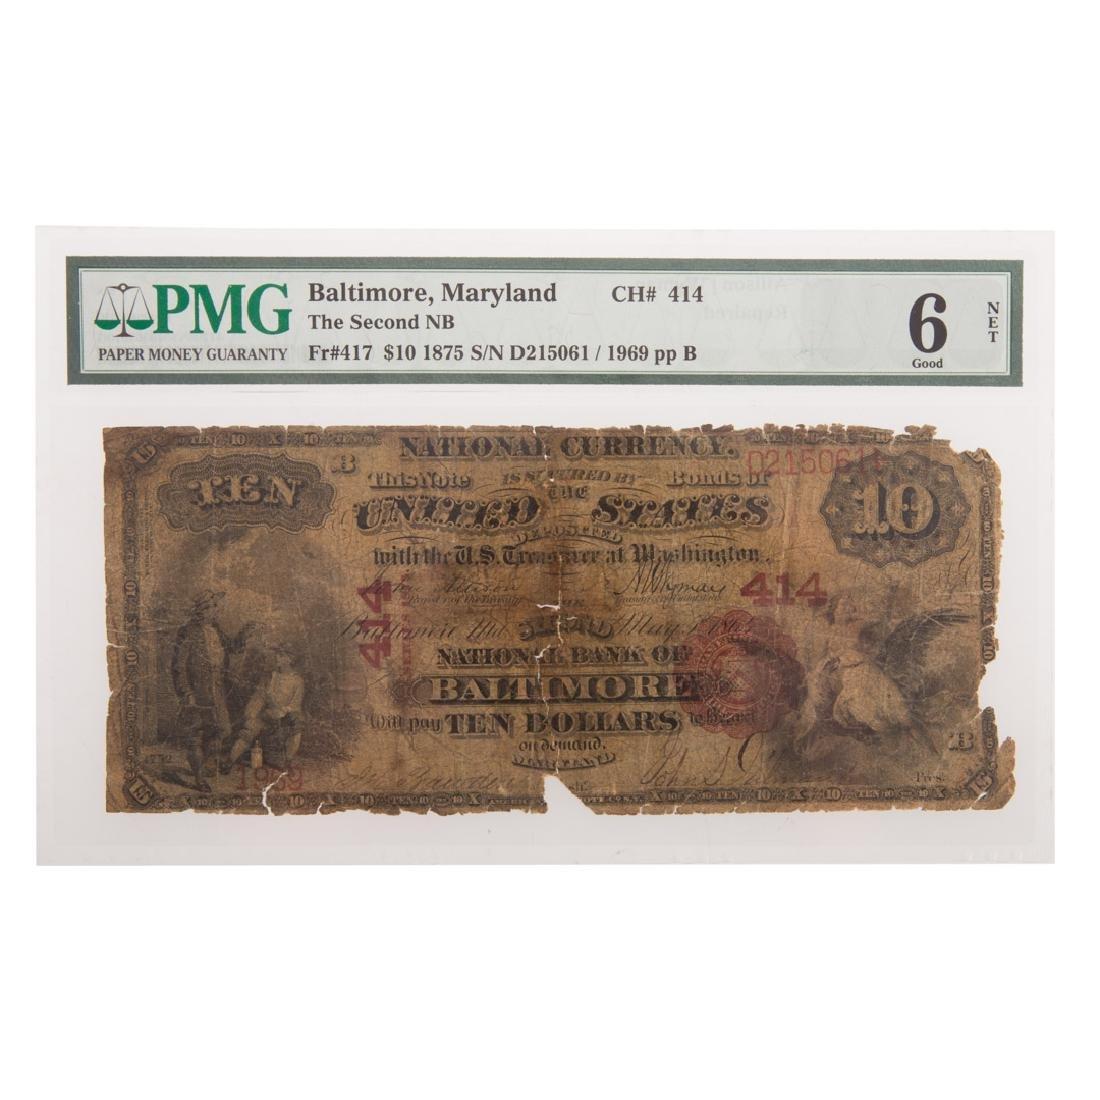 [US] 1875 $10 CH# 414 Fr-417 Baltimore PMG-6